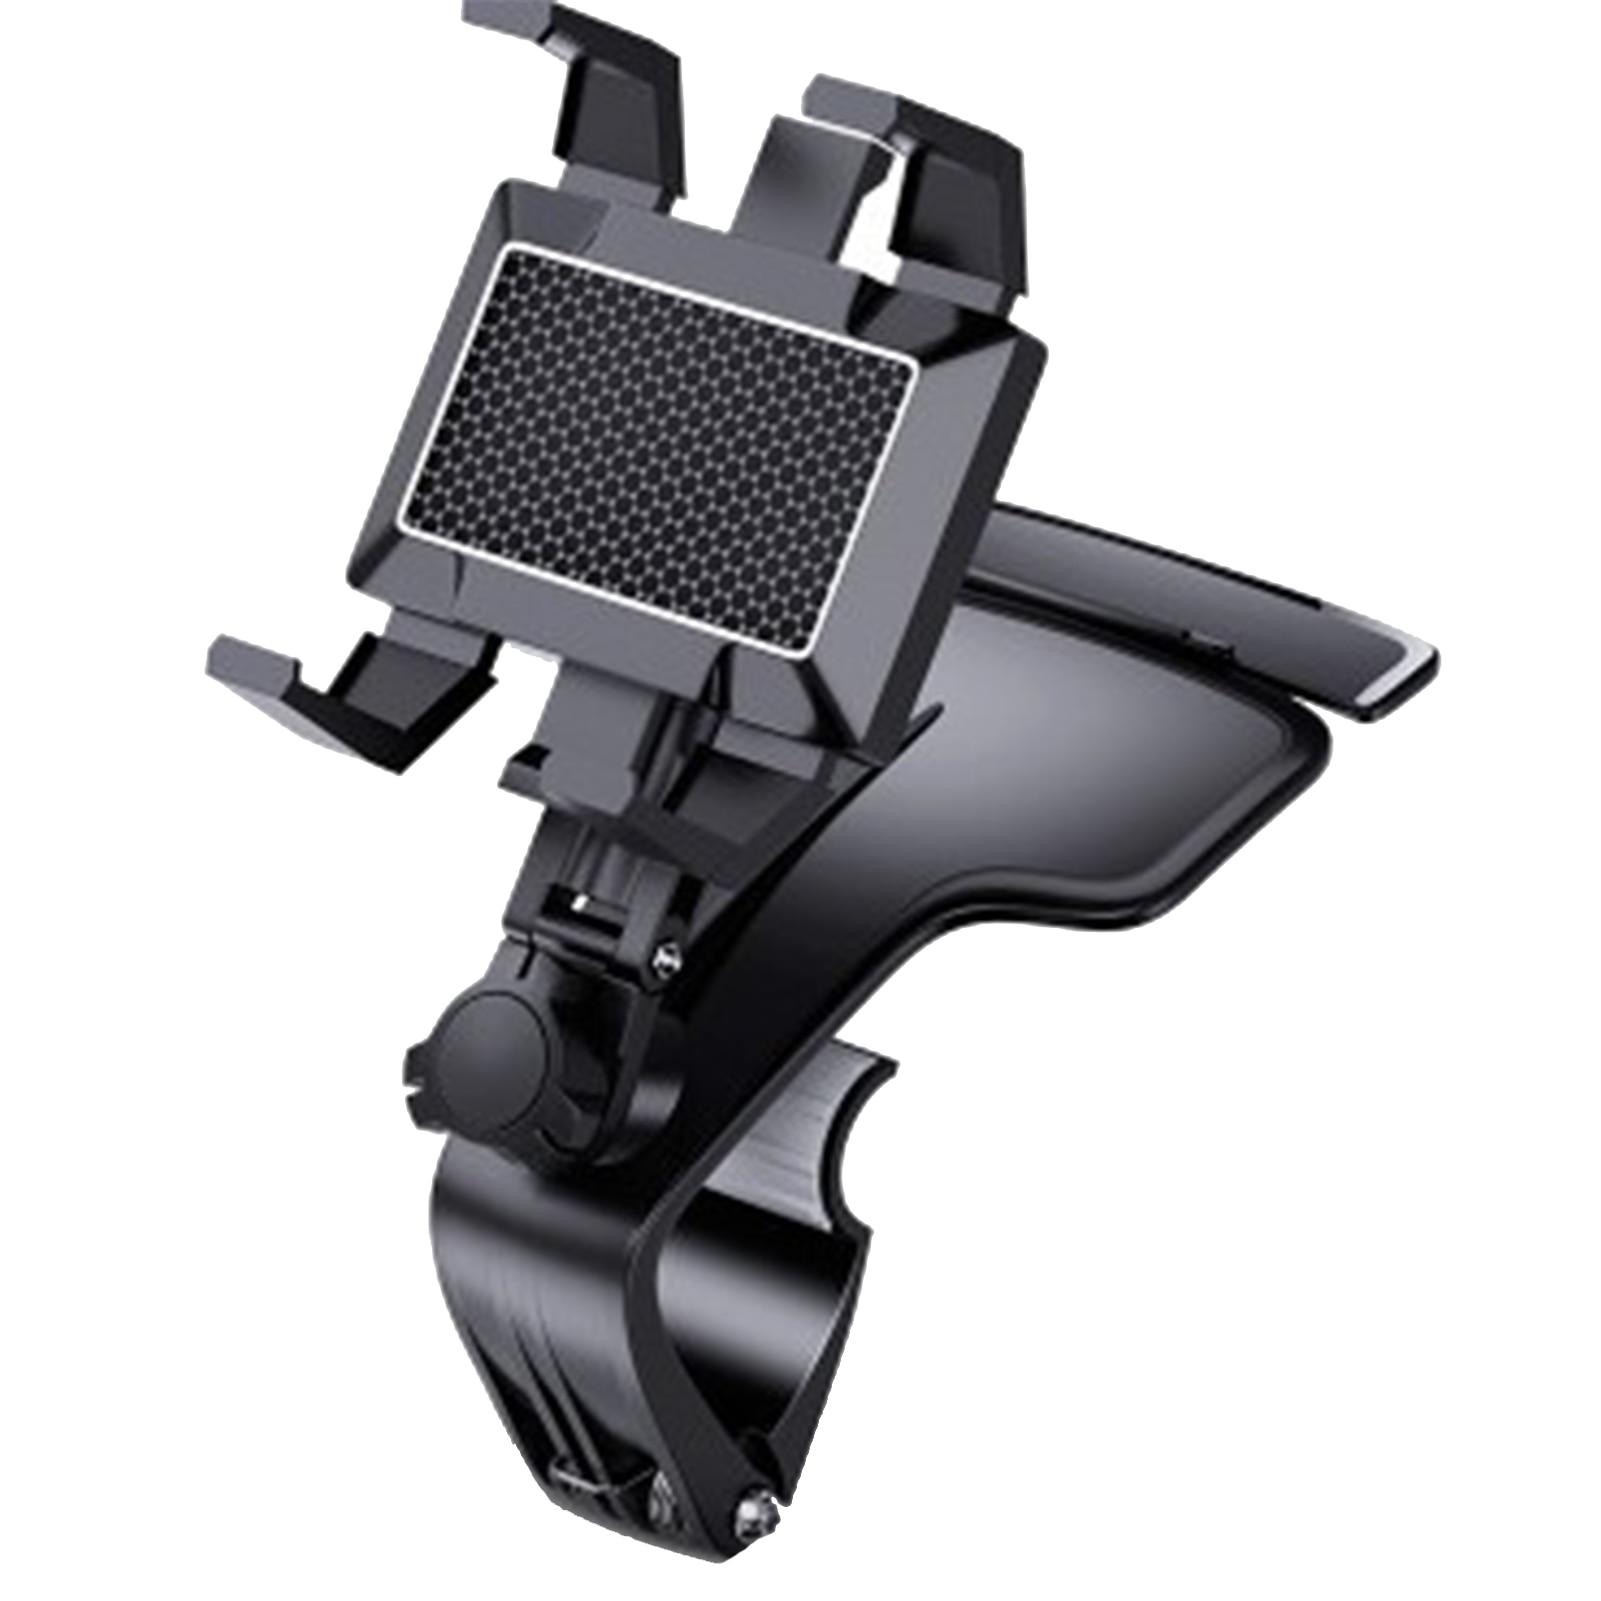 Car Multifunctional Mobile Phone Bracket 360 Degree Sun Visor Mirror Dashboard Mount GPS Stand Phone Holder With Parking Card